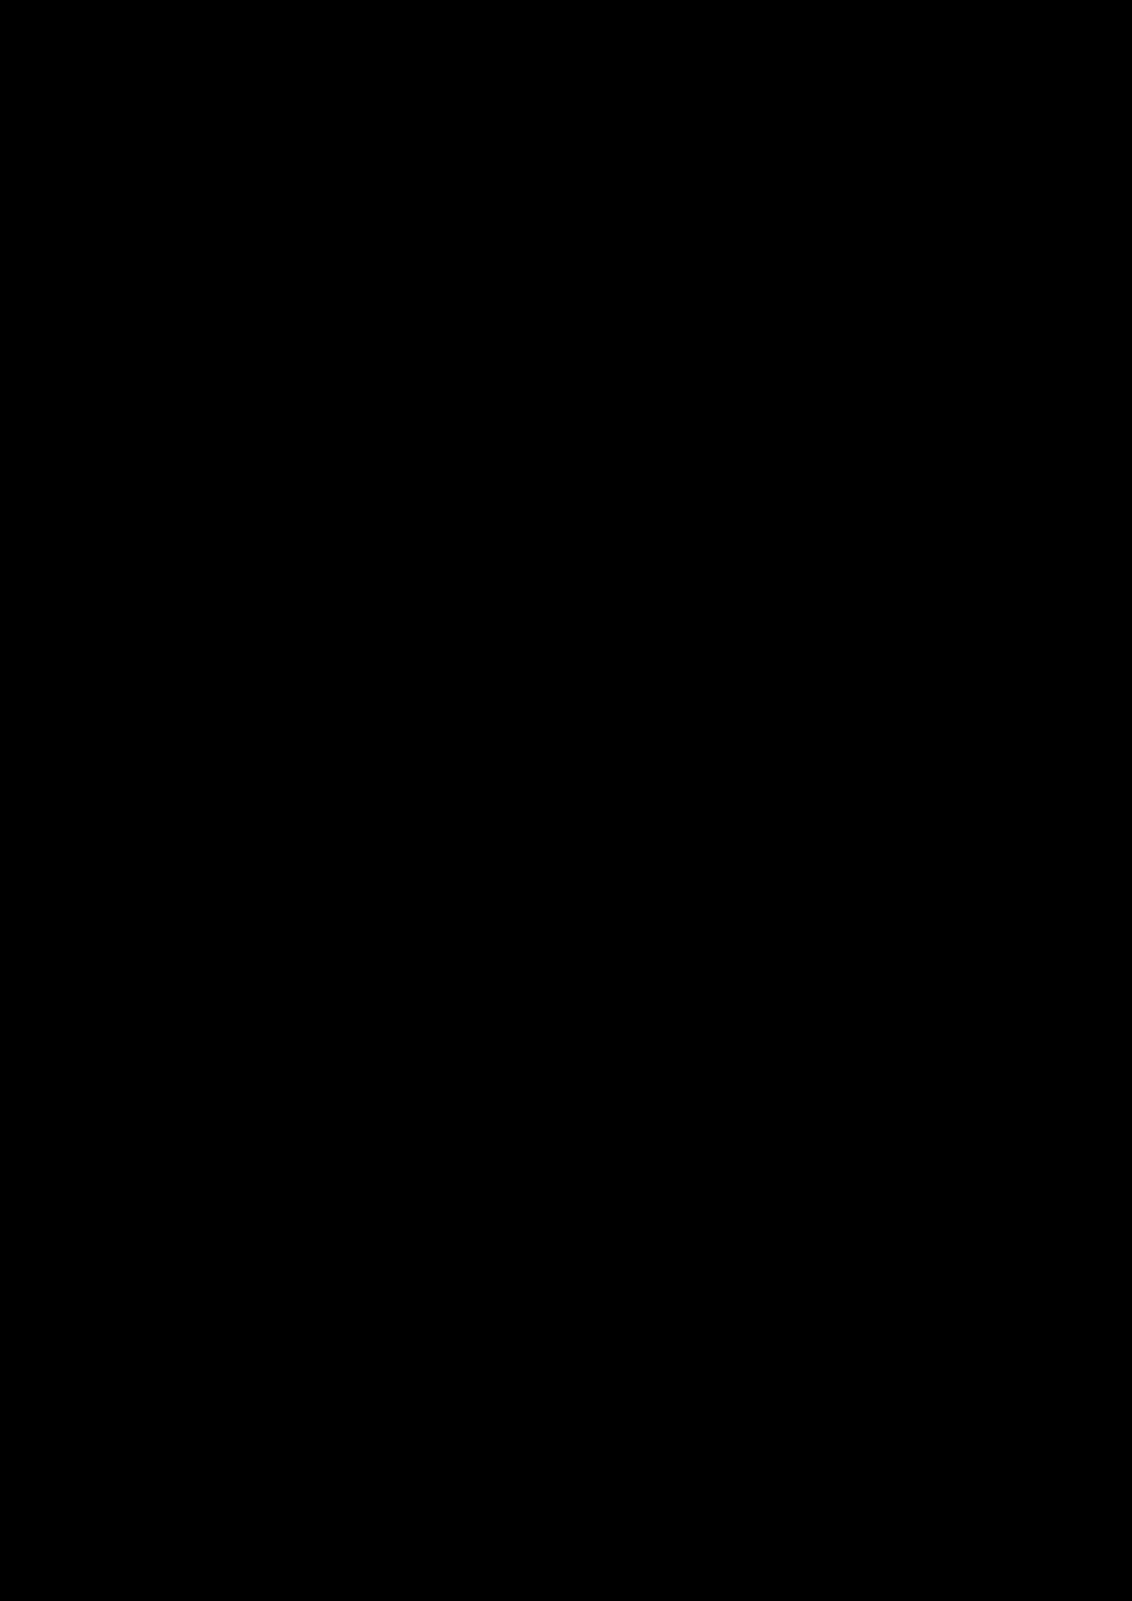 Belyiy sokol slide, Image 41